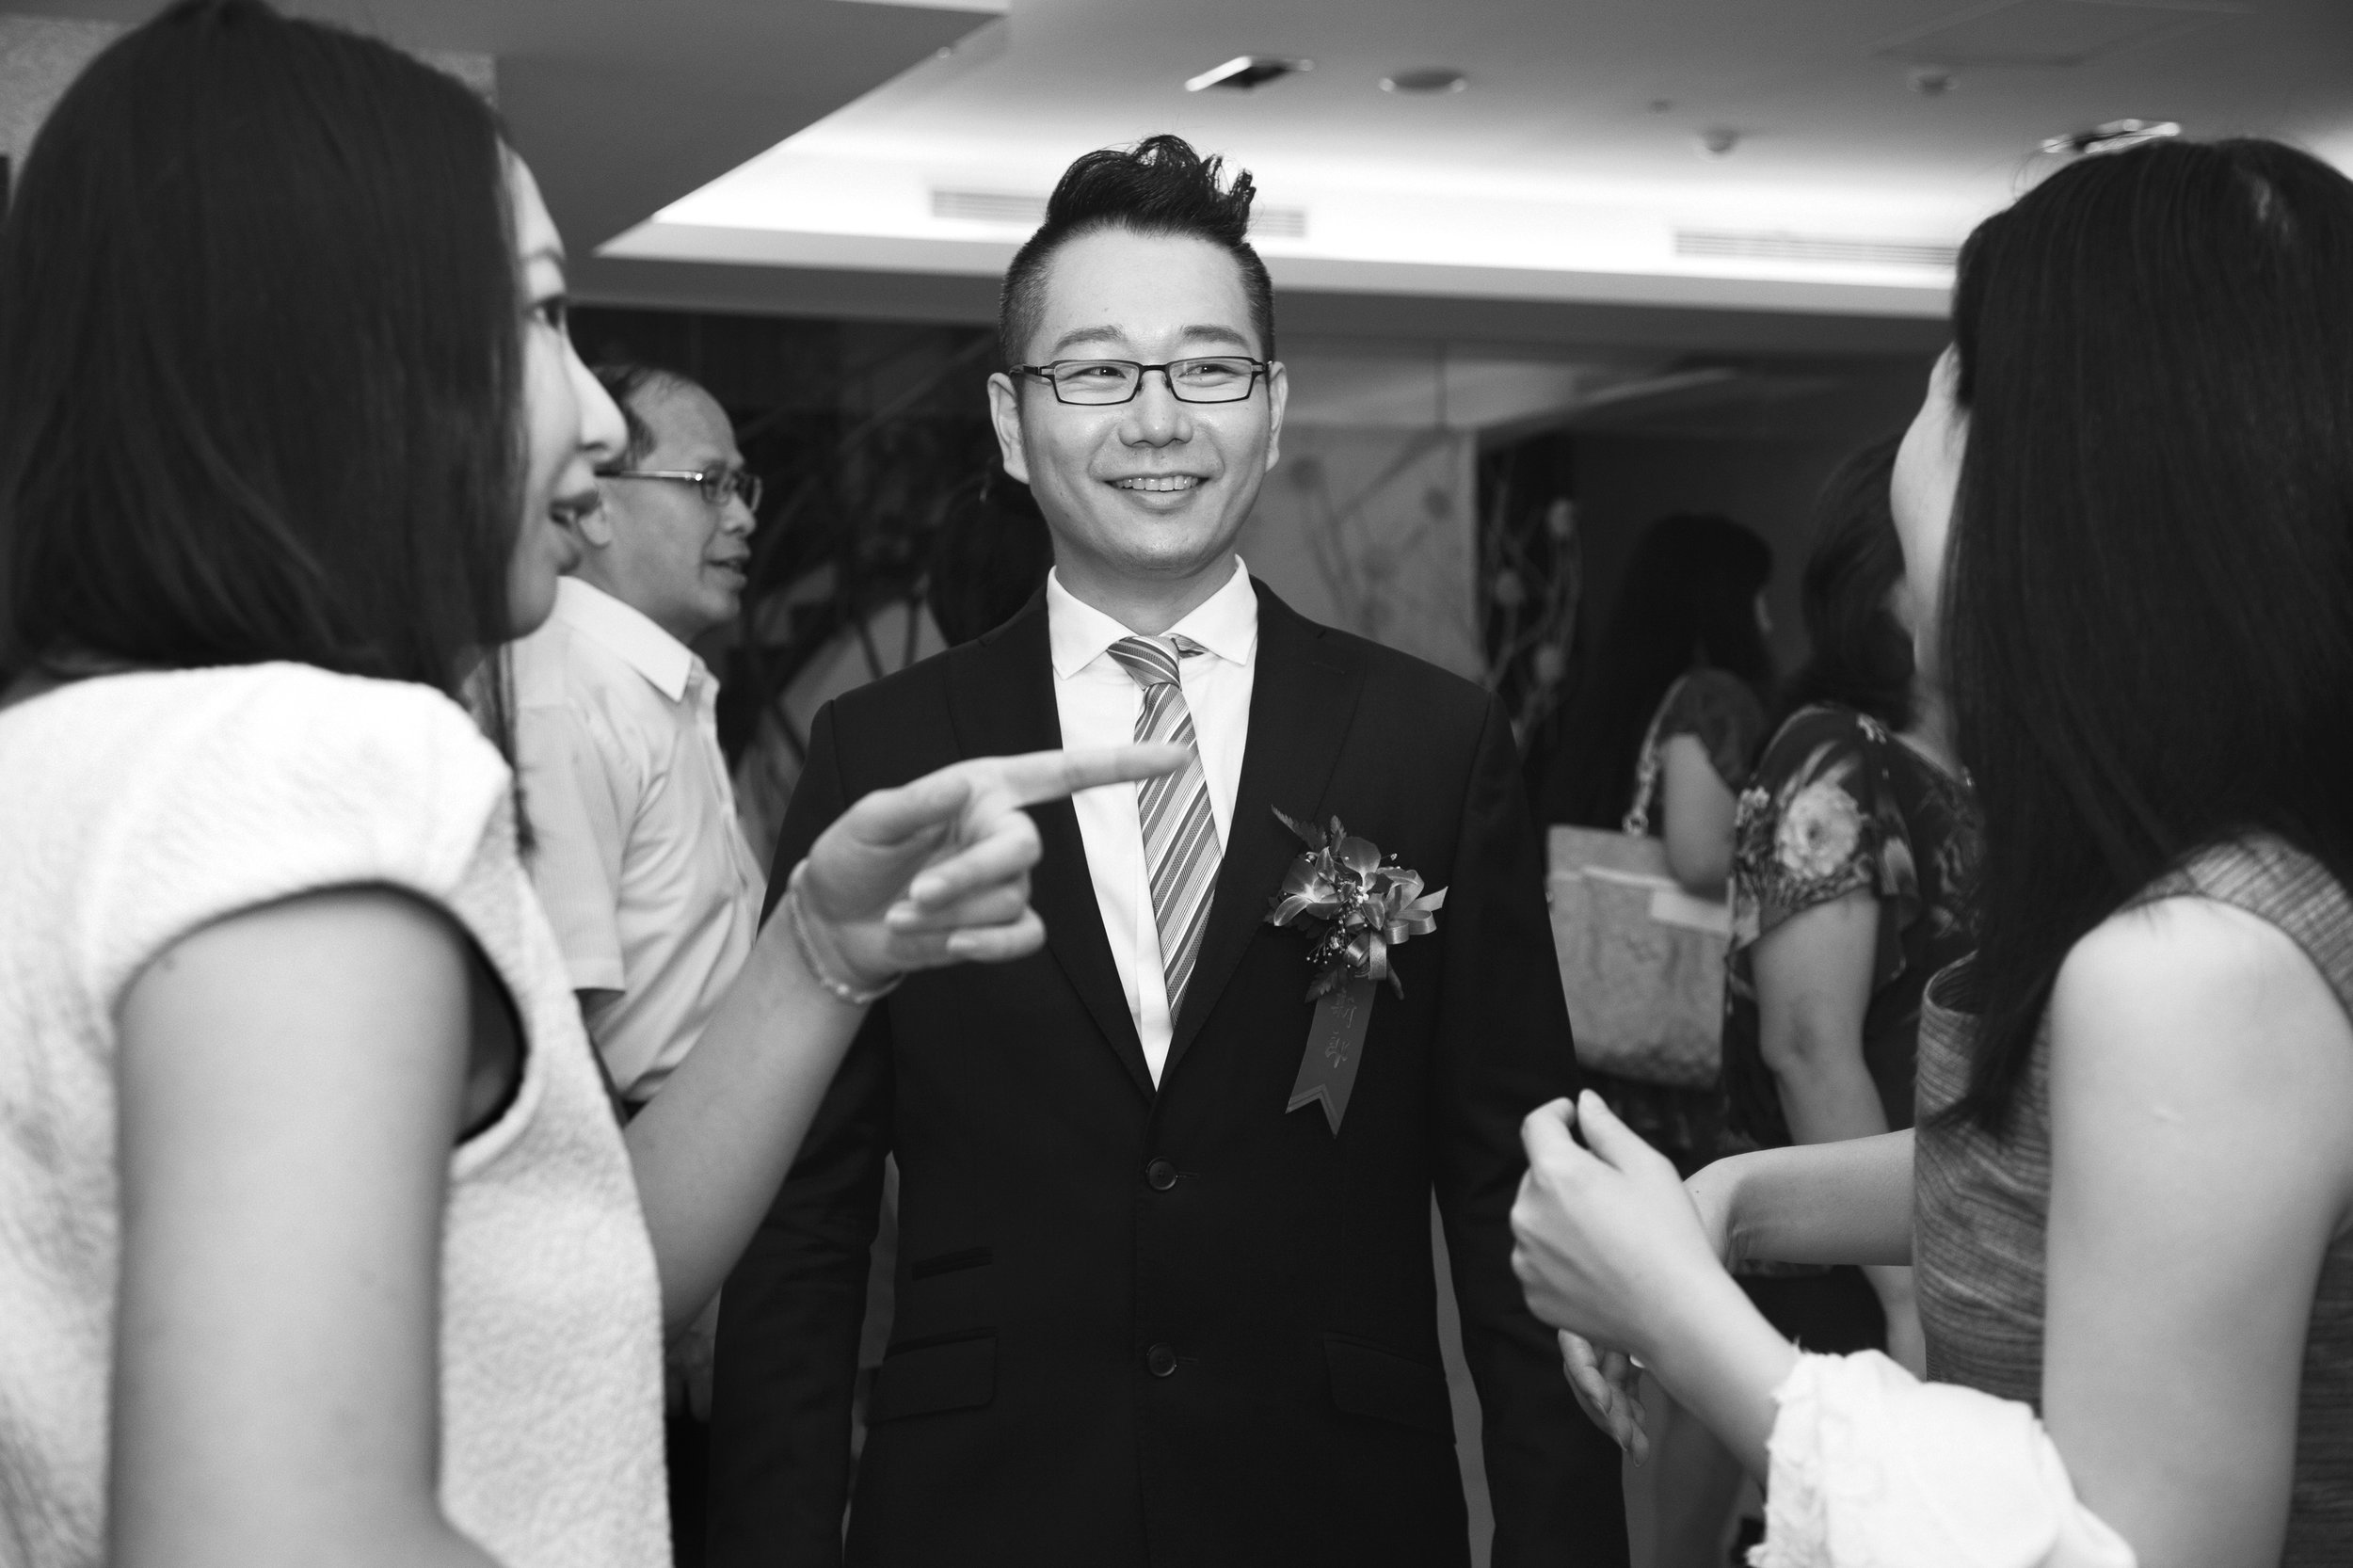 [JC]CREATIVE 女性攝影師 北投儷宴會館 補請台灣WEDDING    自然風格 台北婚攝推 女婚攝  桃園婚攝   圖像00100.JPG